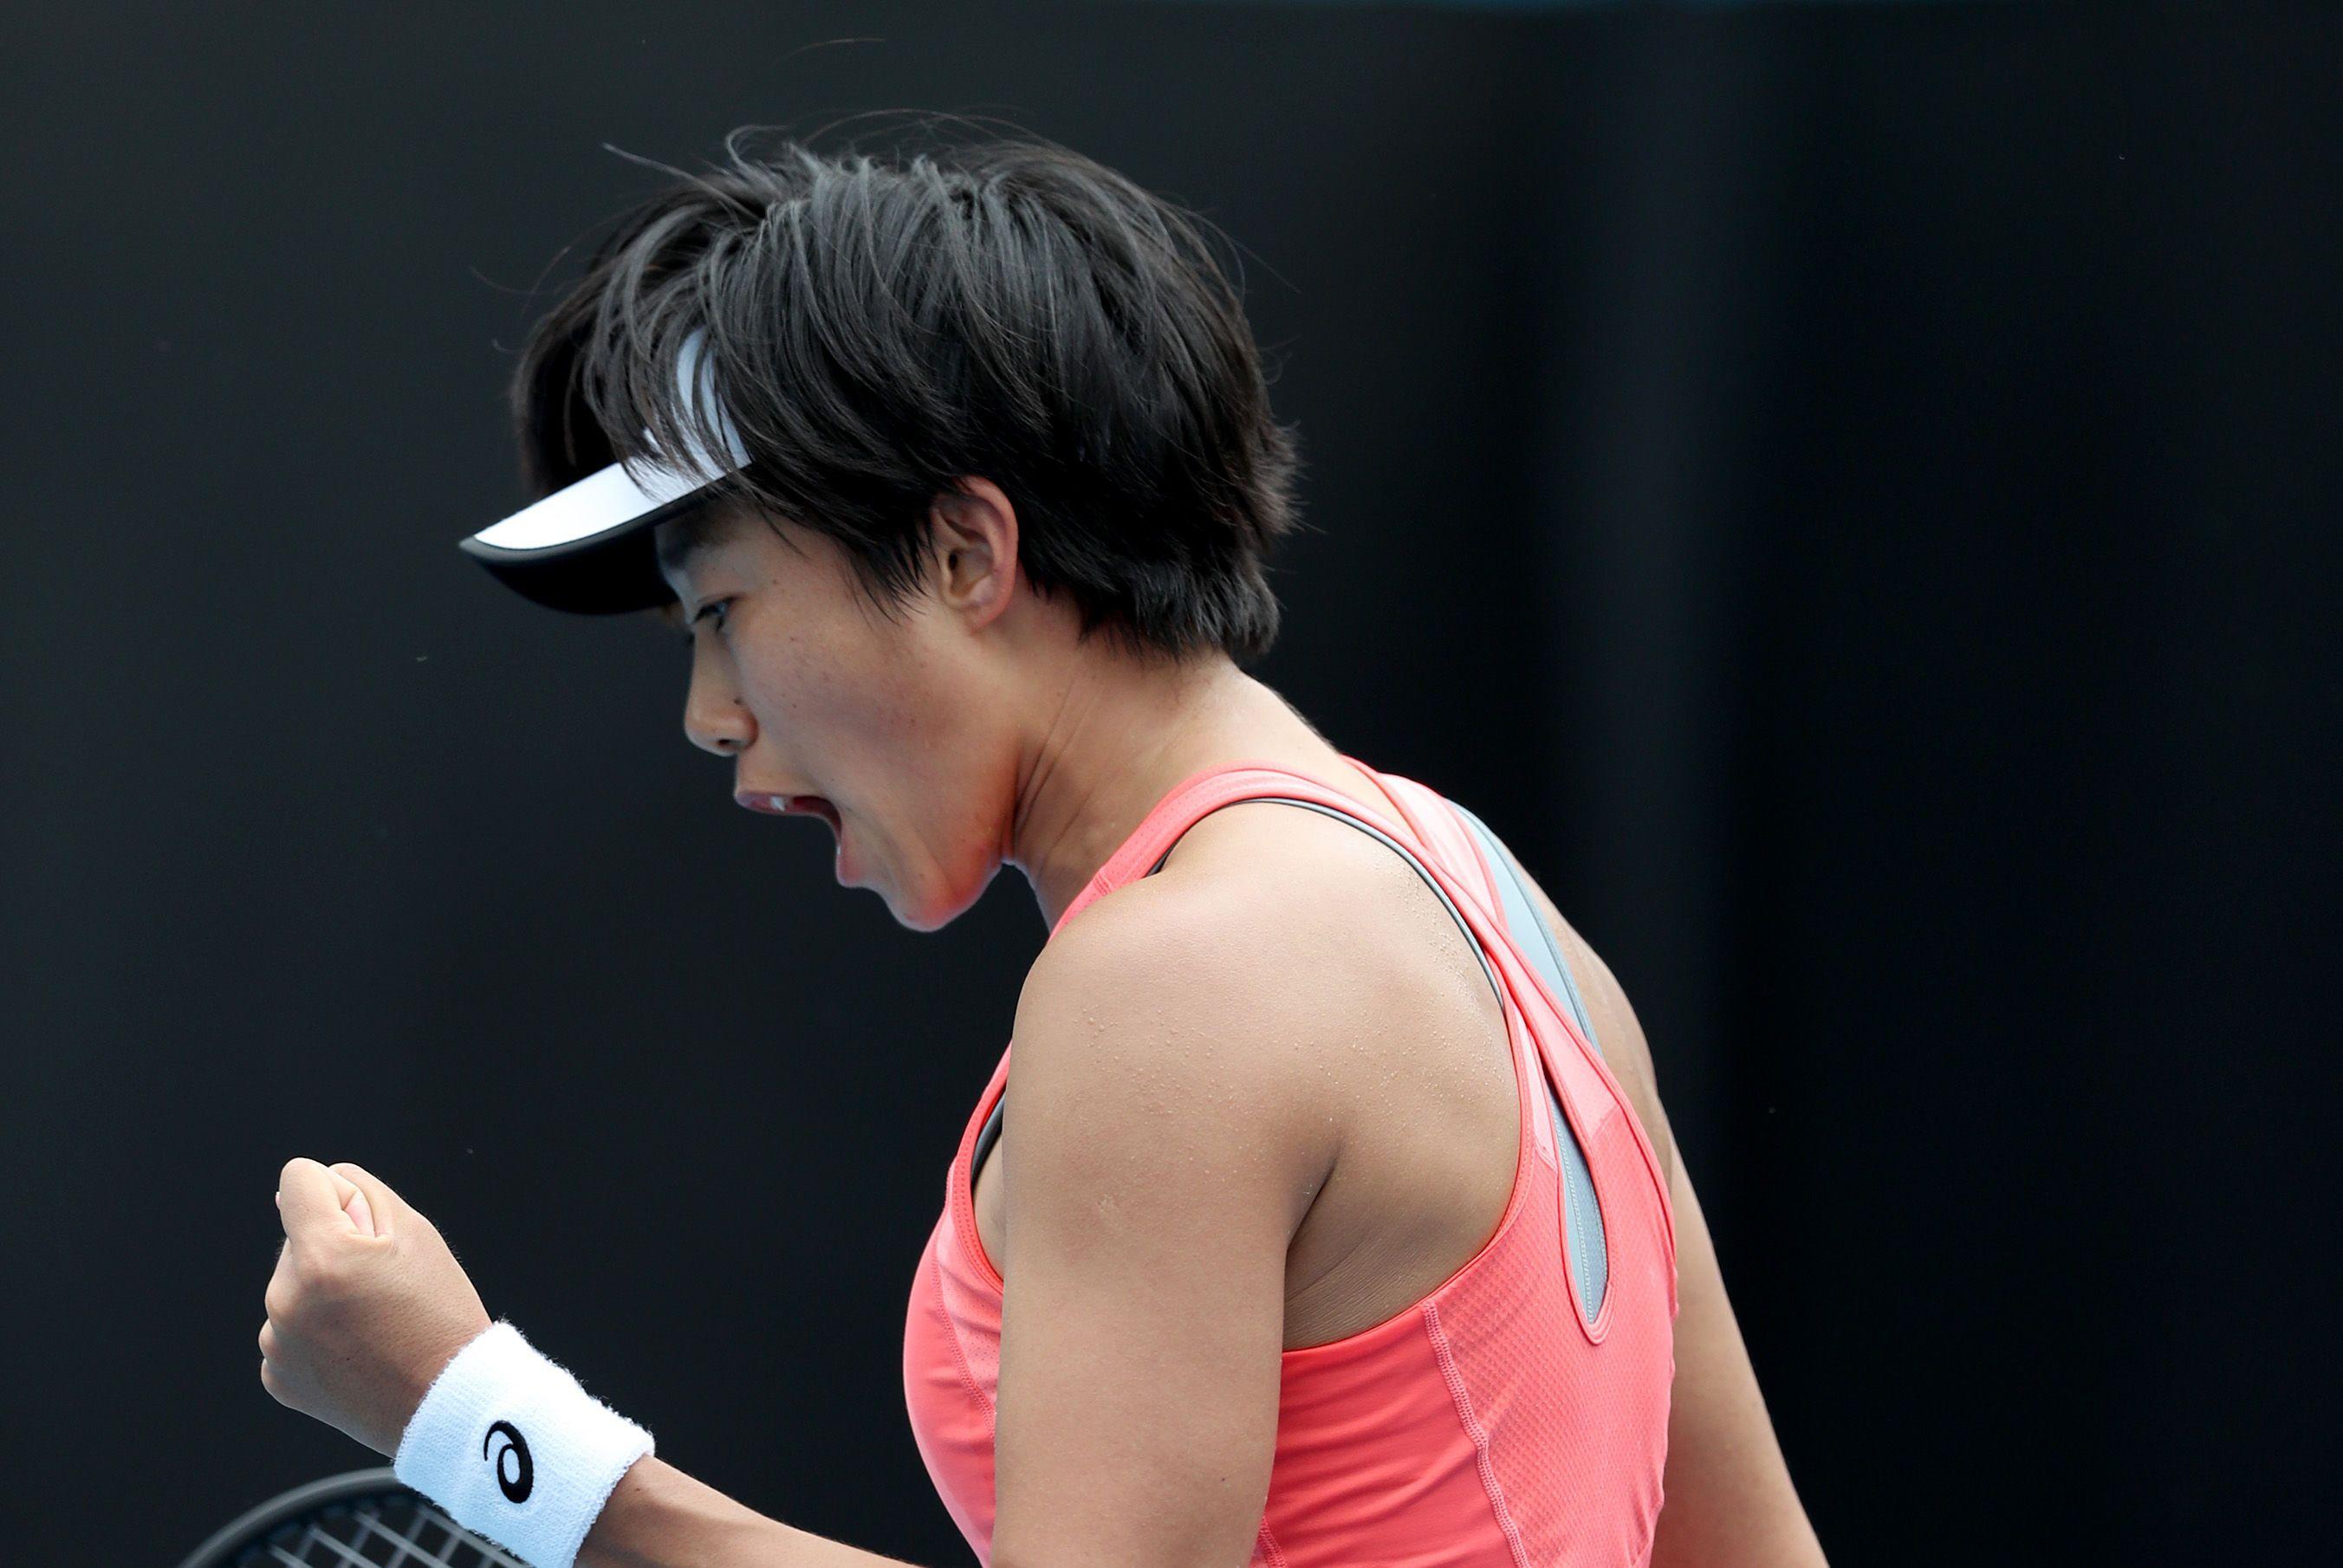 WTA迪拜冠军赛战报:张帅不敌纳瓦罗出局,郑赛赛同样止步次轮!